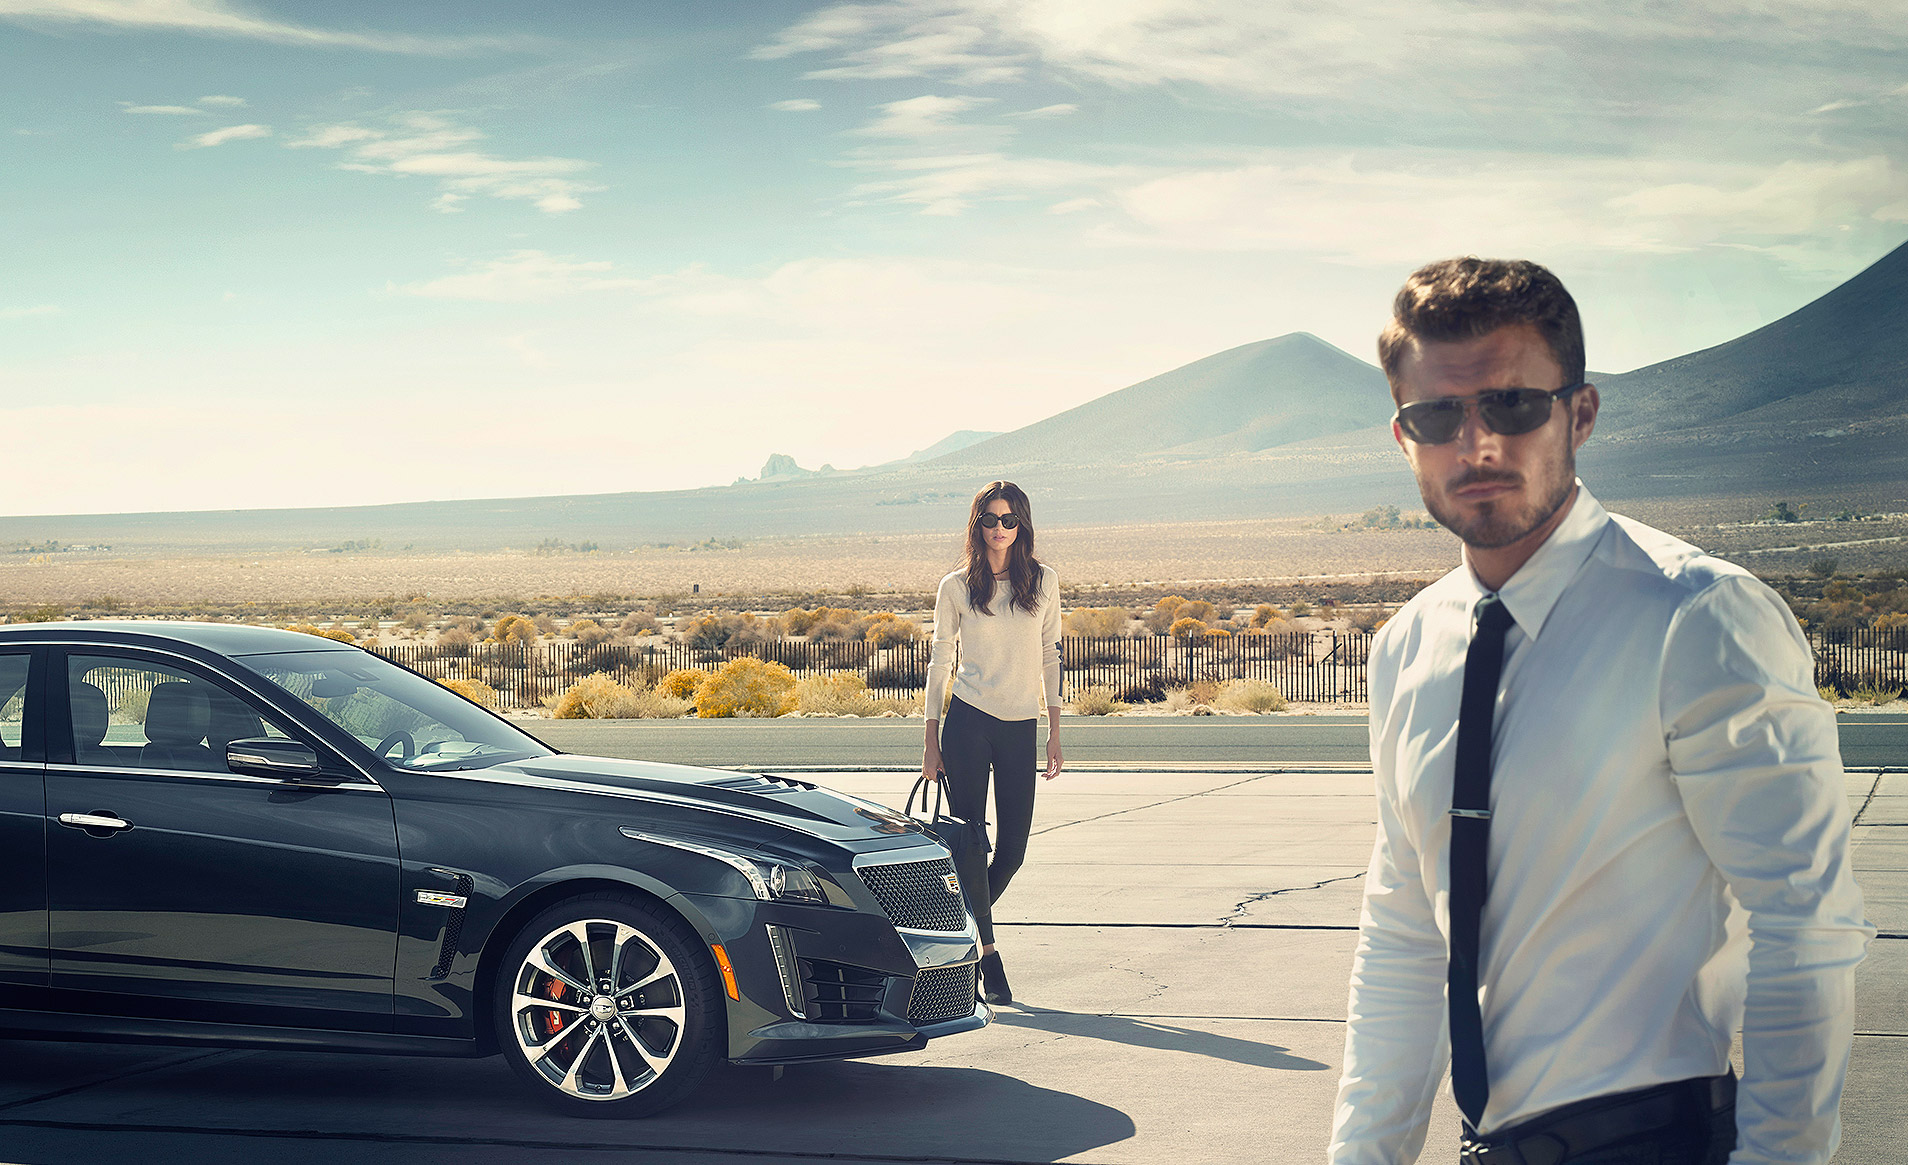 Latest U.S Market Performance For Cadillac, Jaguar Land Rover & Porsche